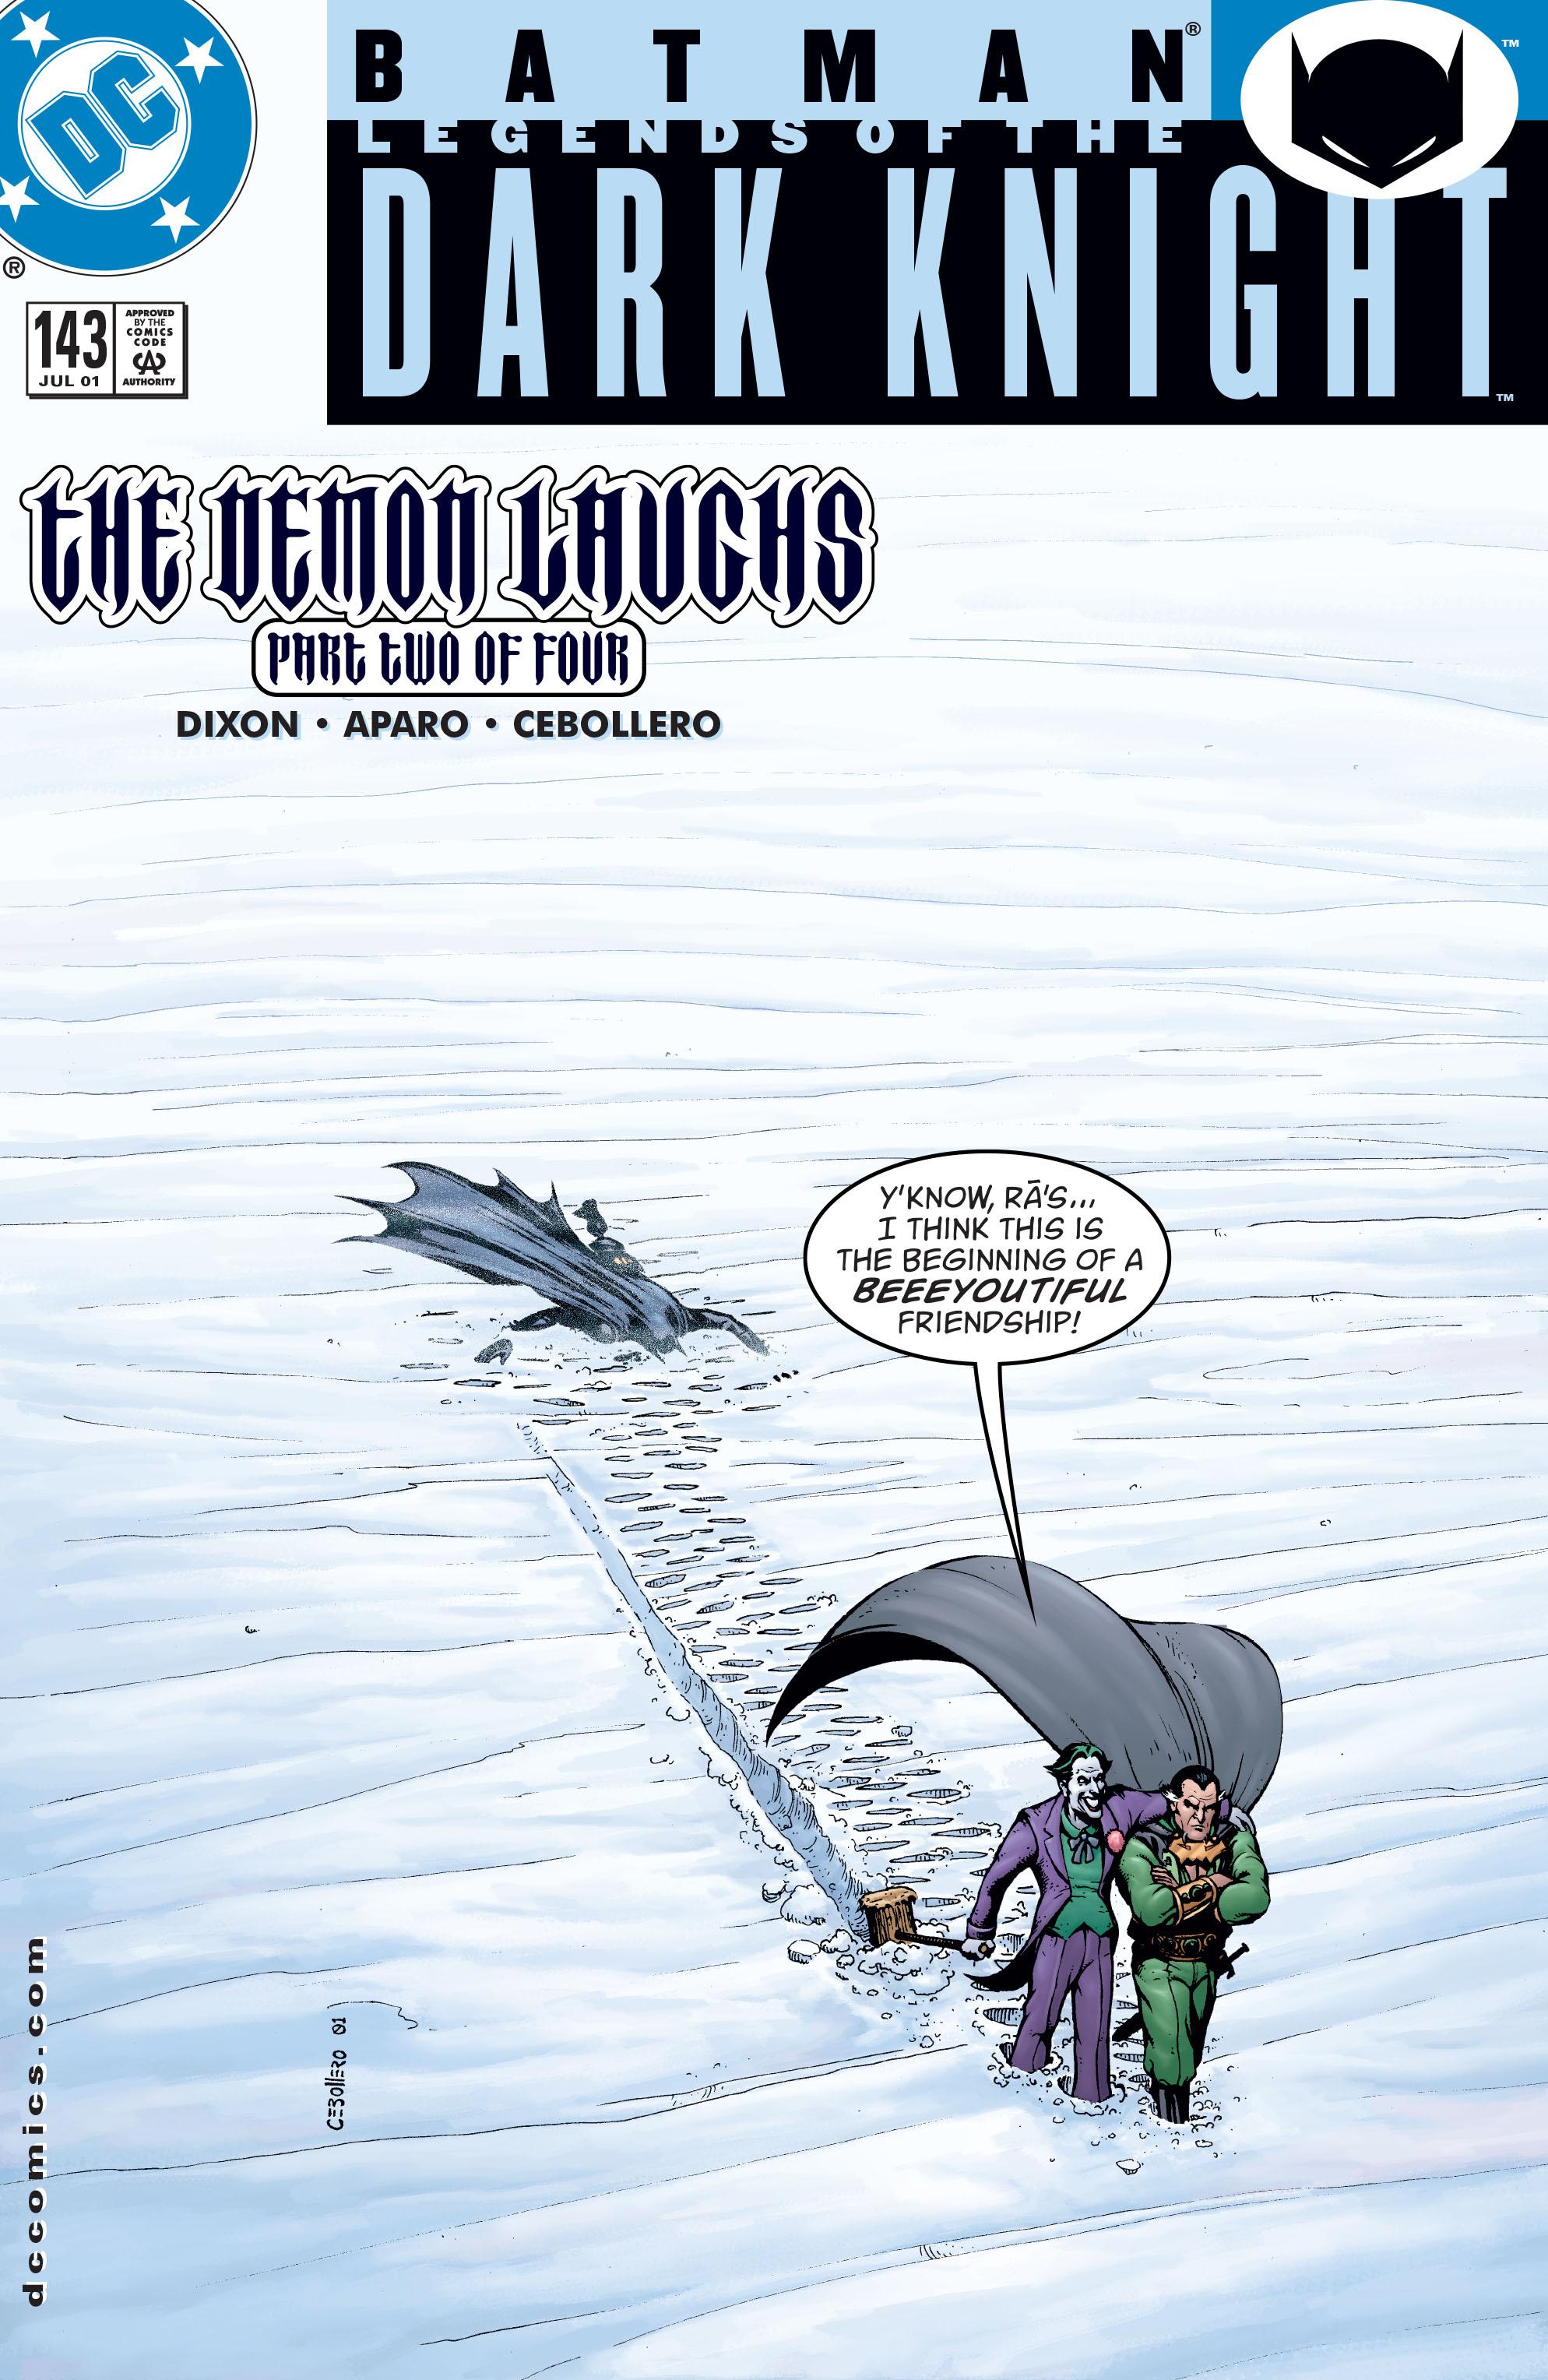 Batman: Legends of the Dark Knight 143 Page 1